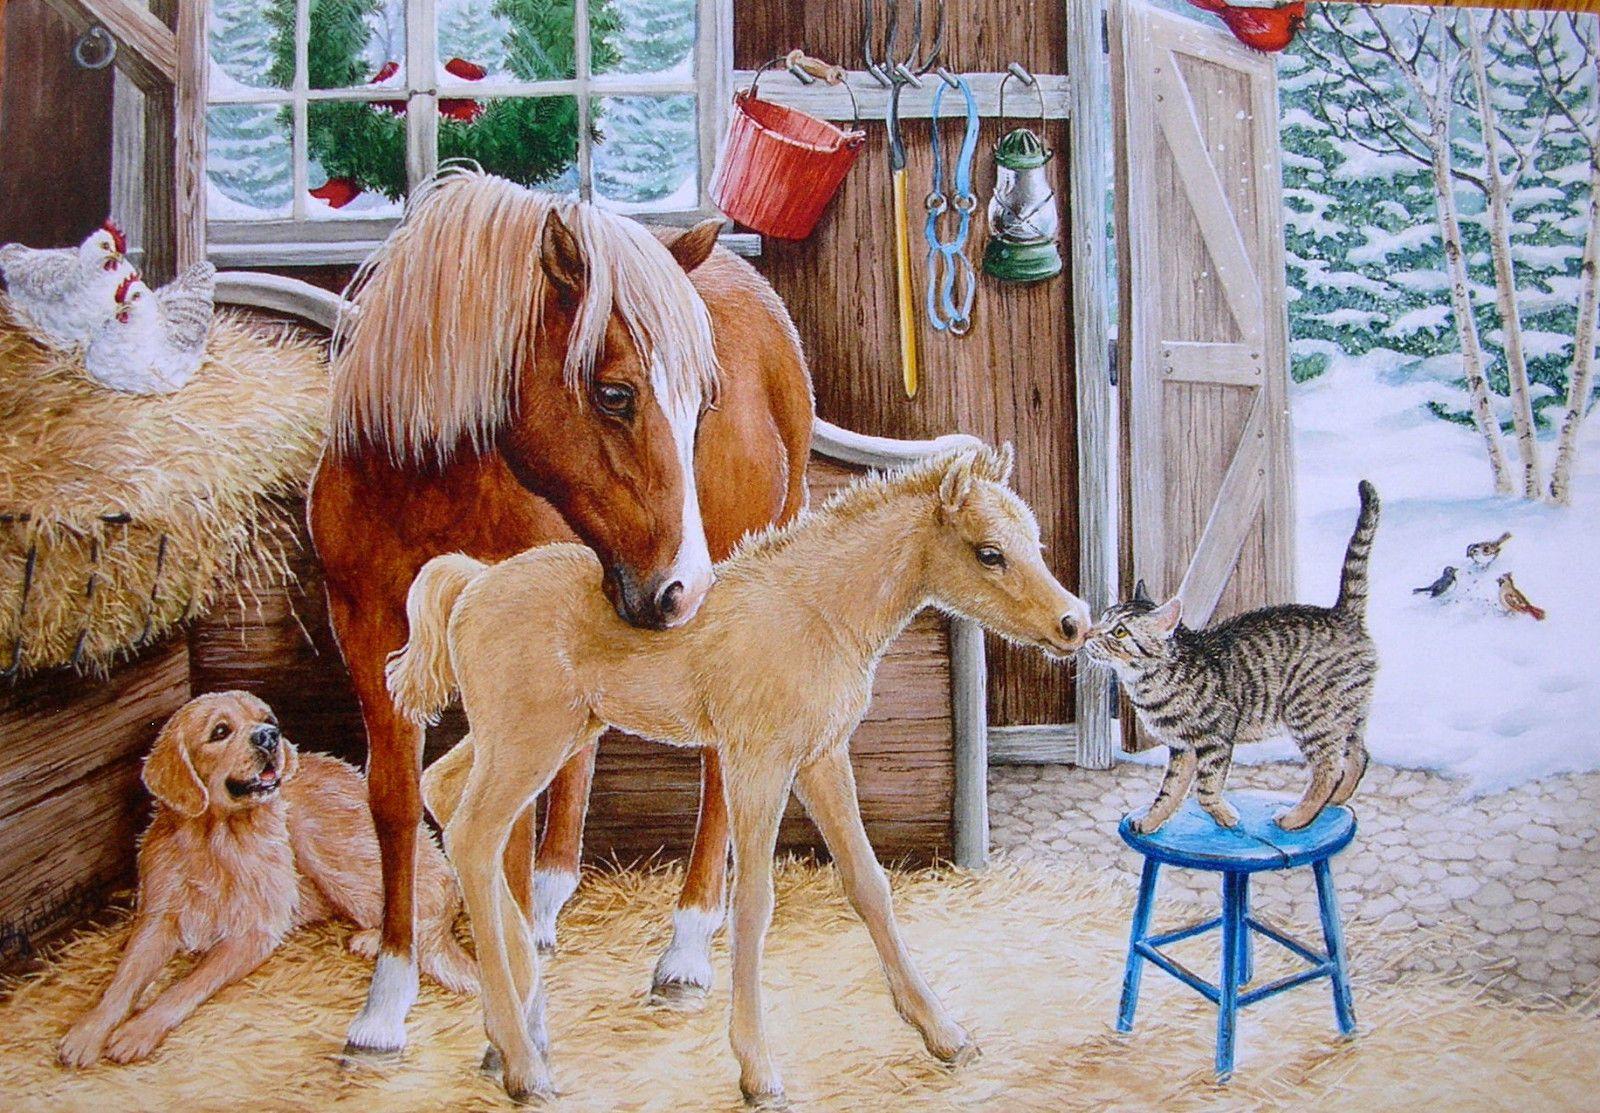 Amazing Wallpaper Horse Vintage - dd7e87e6e479177ab94aa83dc7890bdf  Trends_30975.jpg